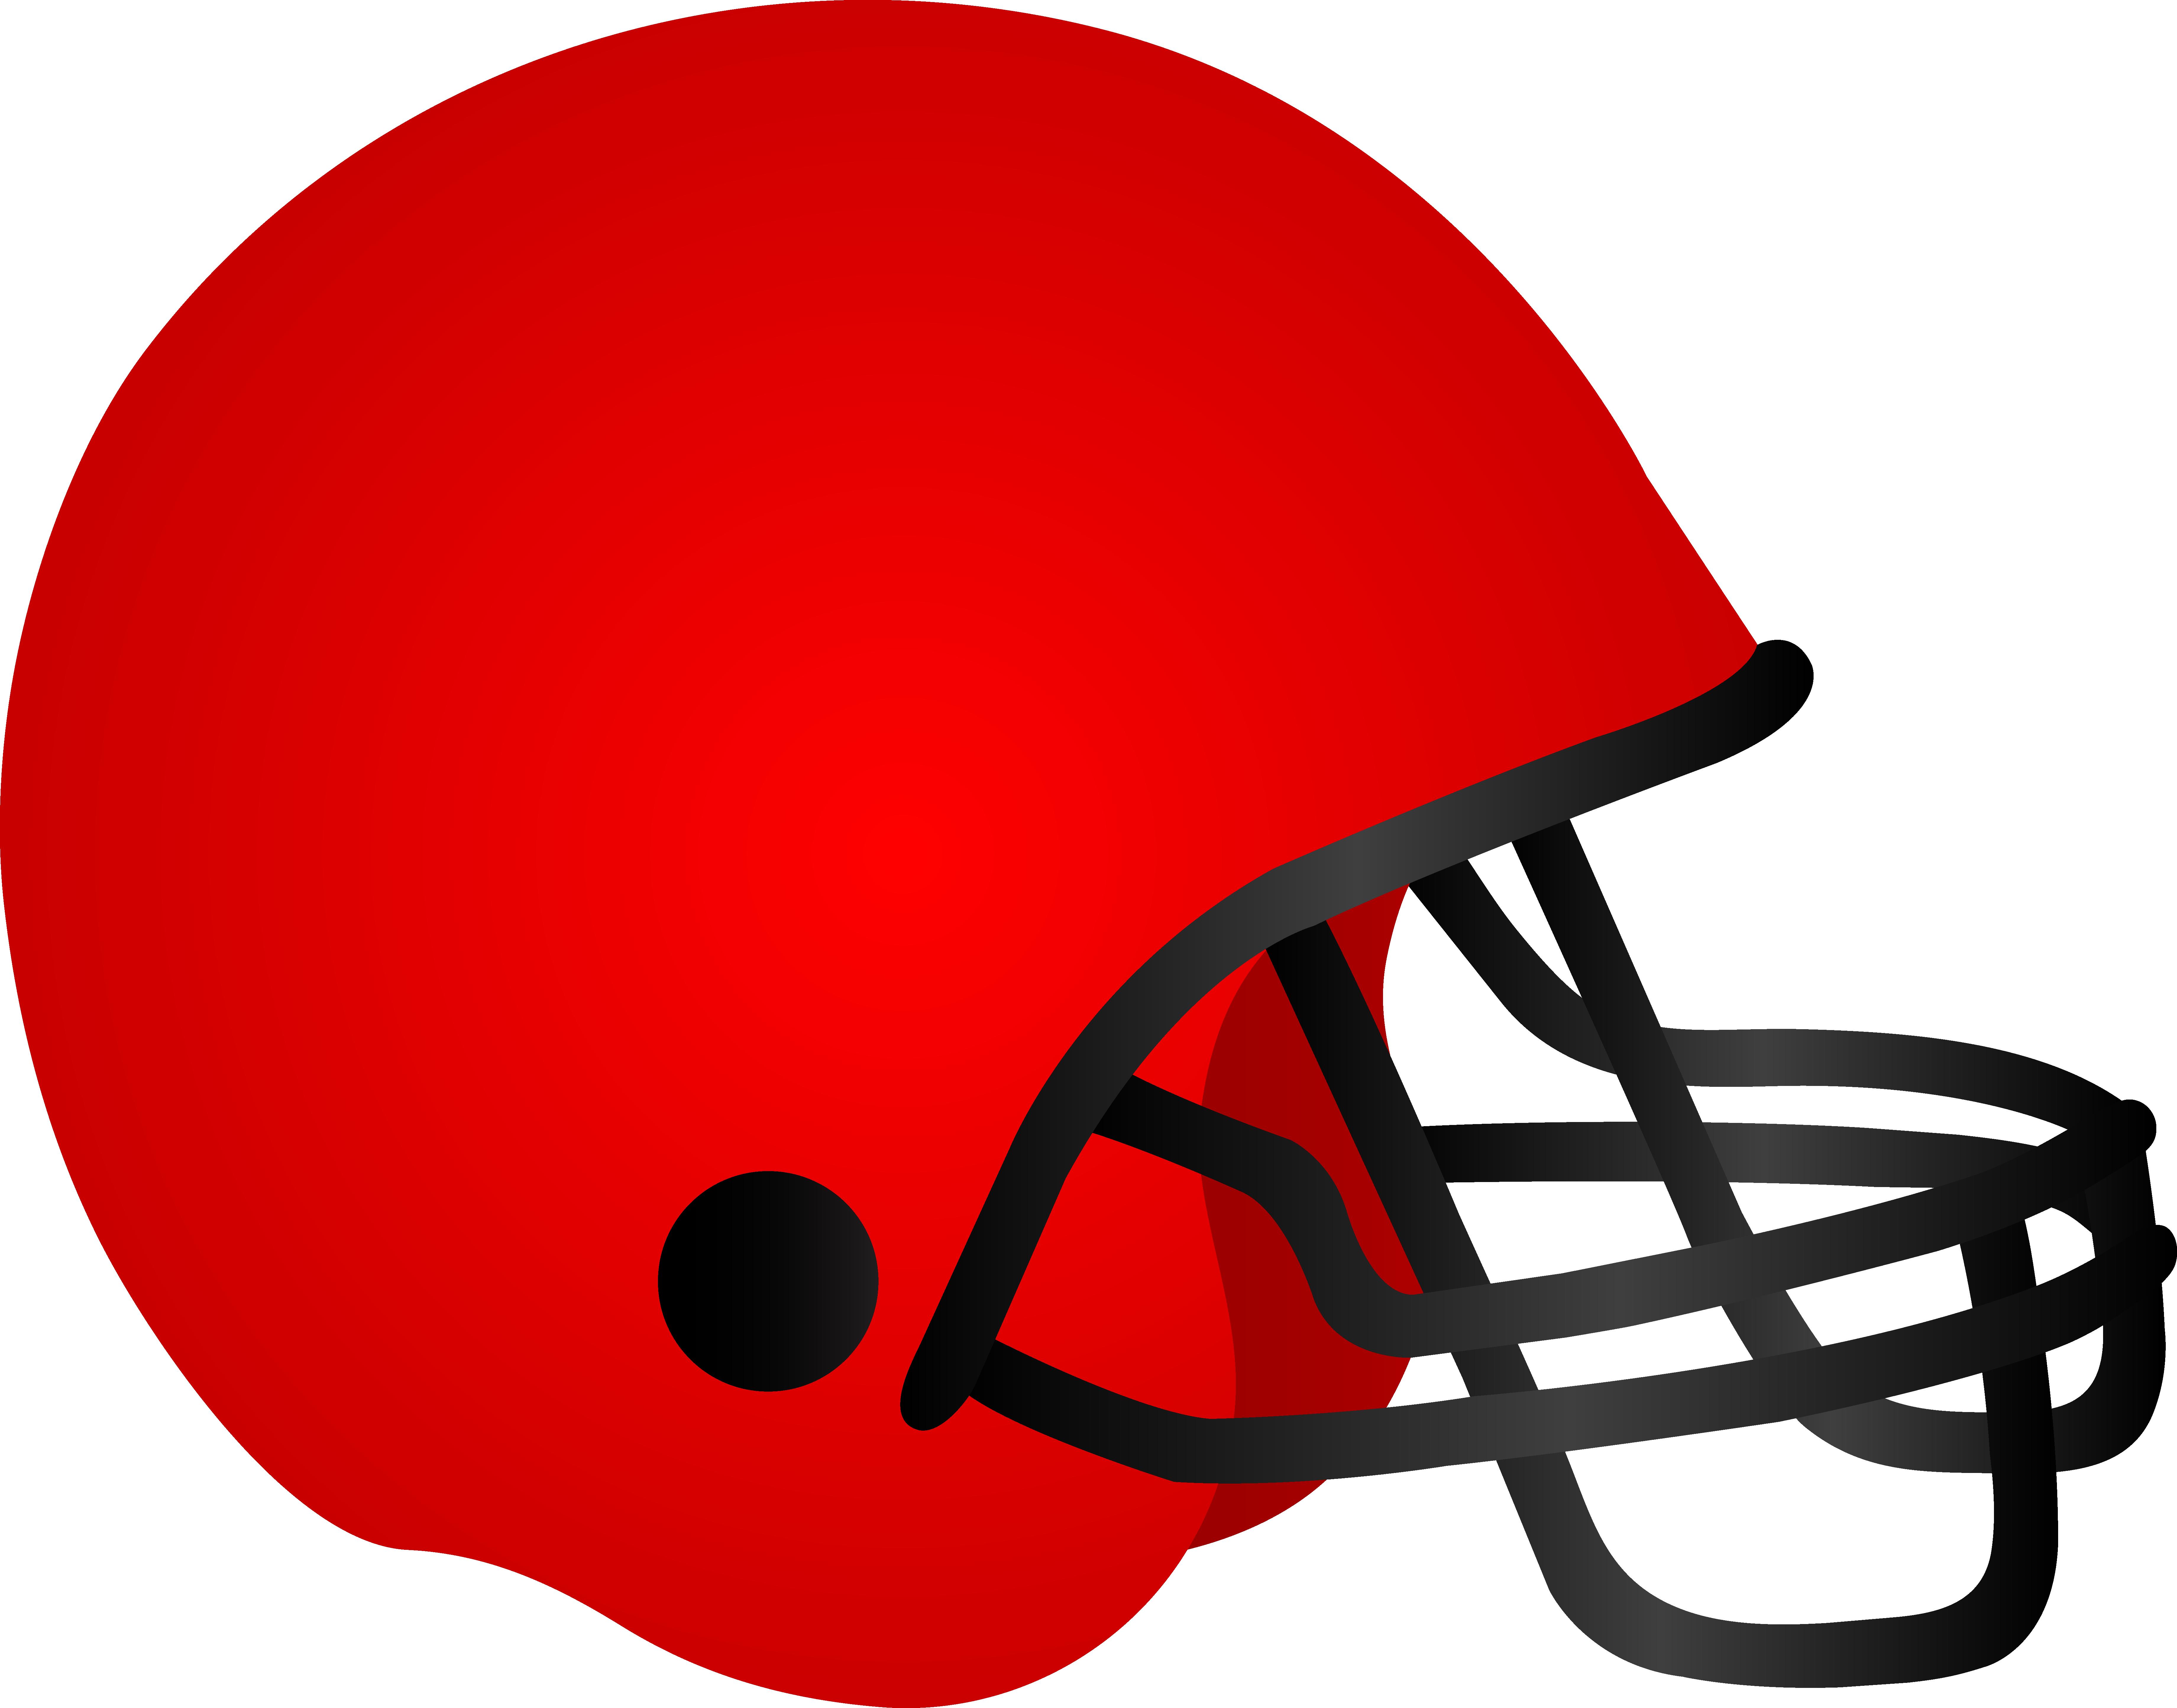 7362x5777 Ball Clipart Football Helmet